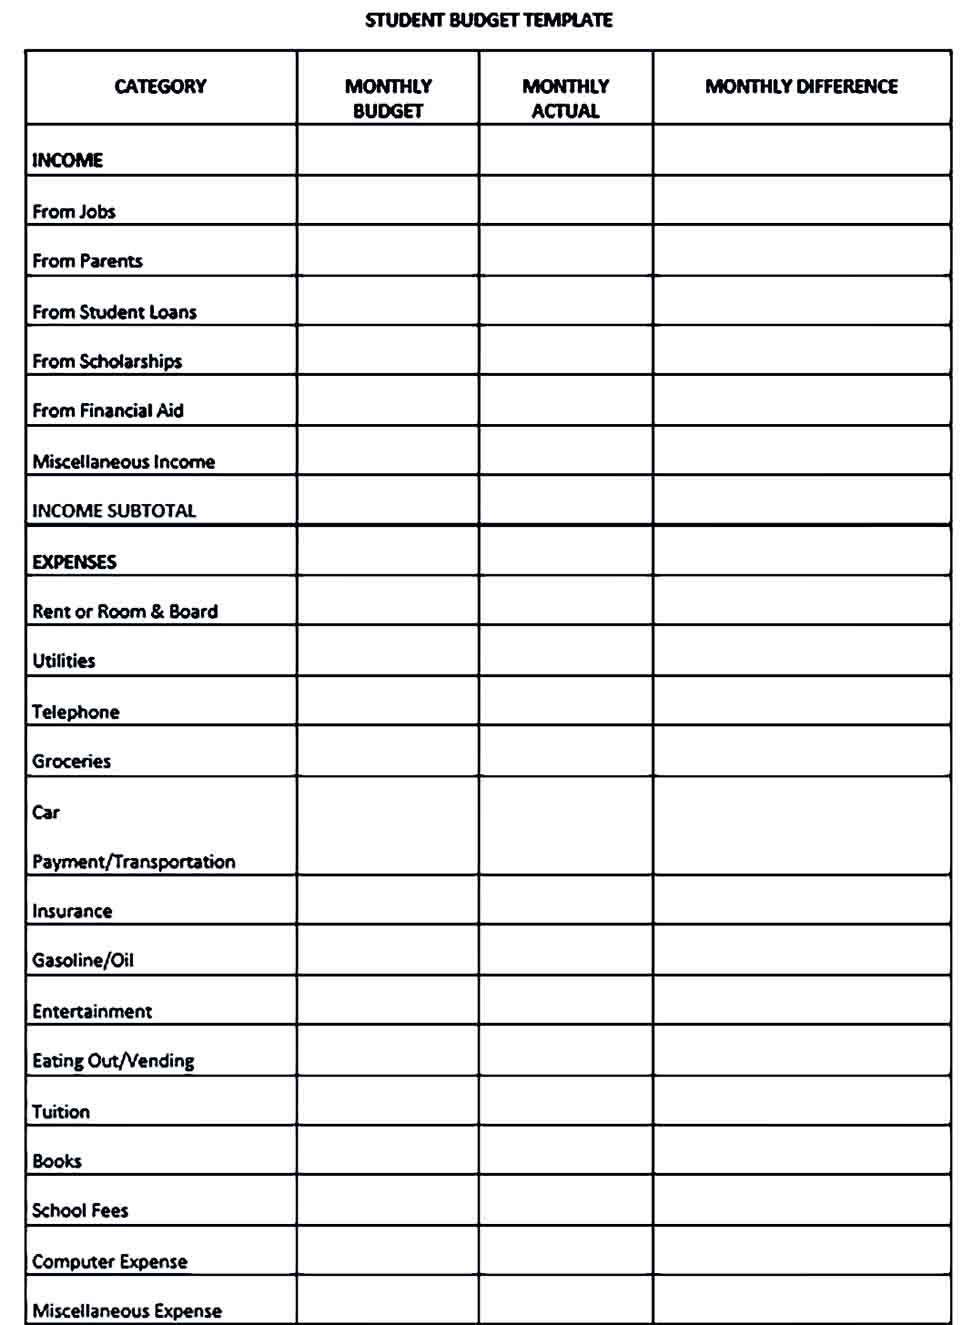 Sample student budget 002